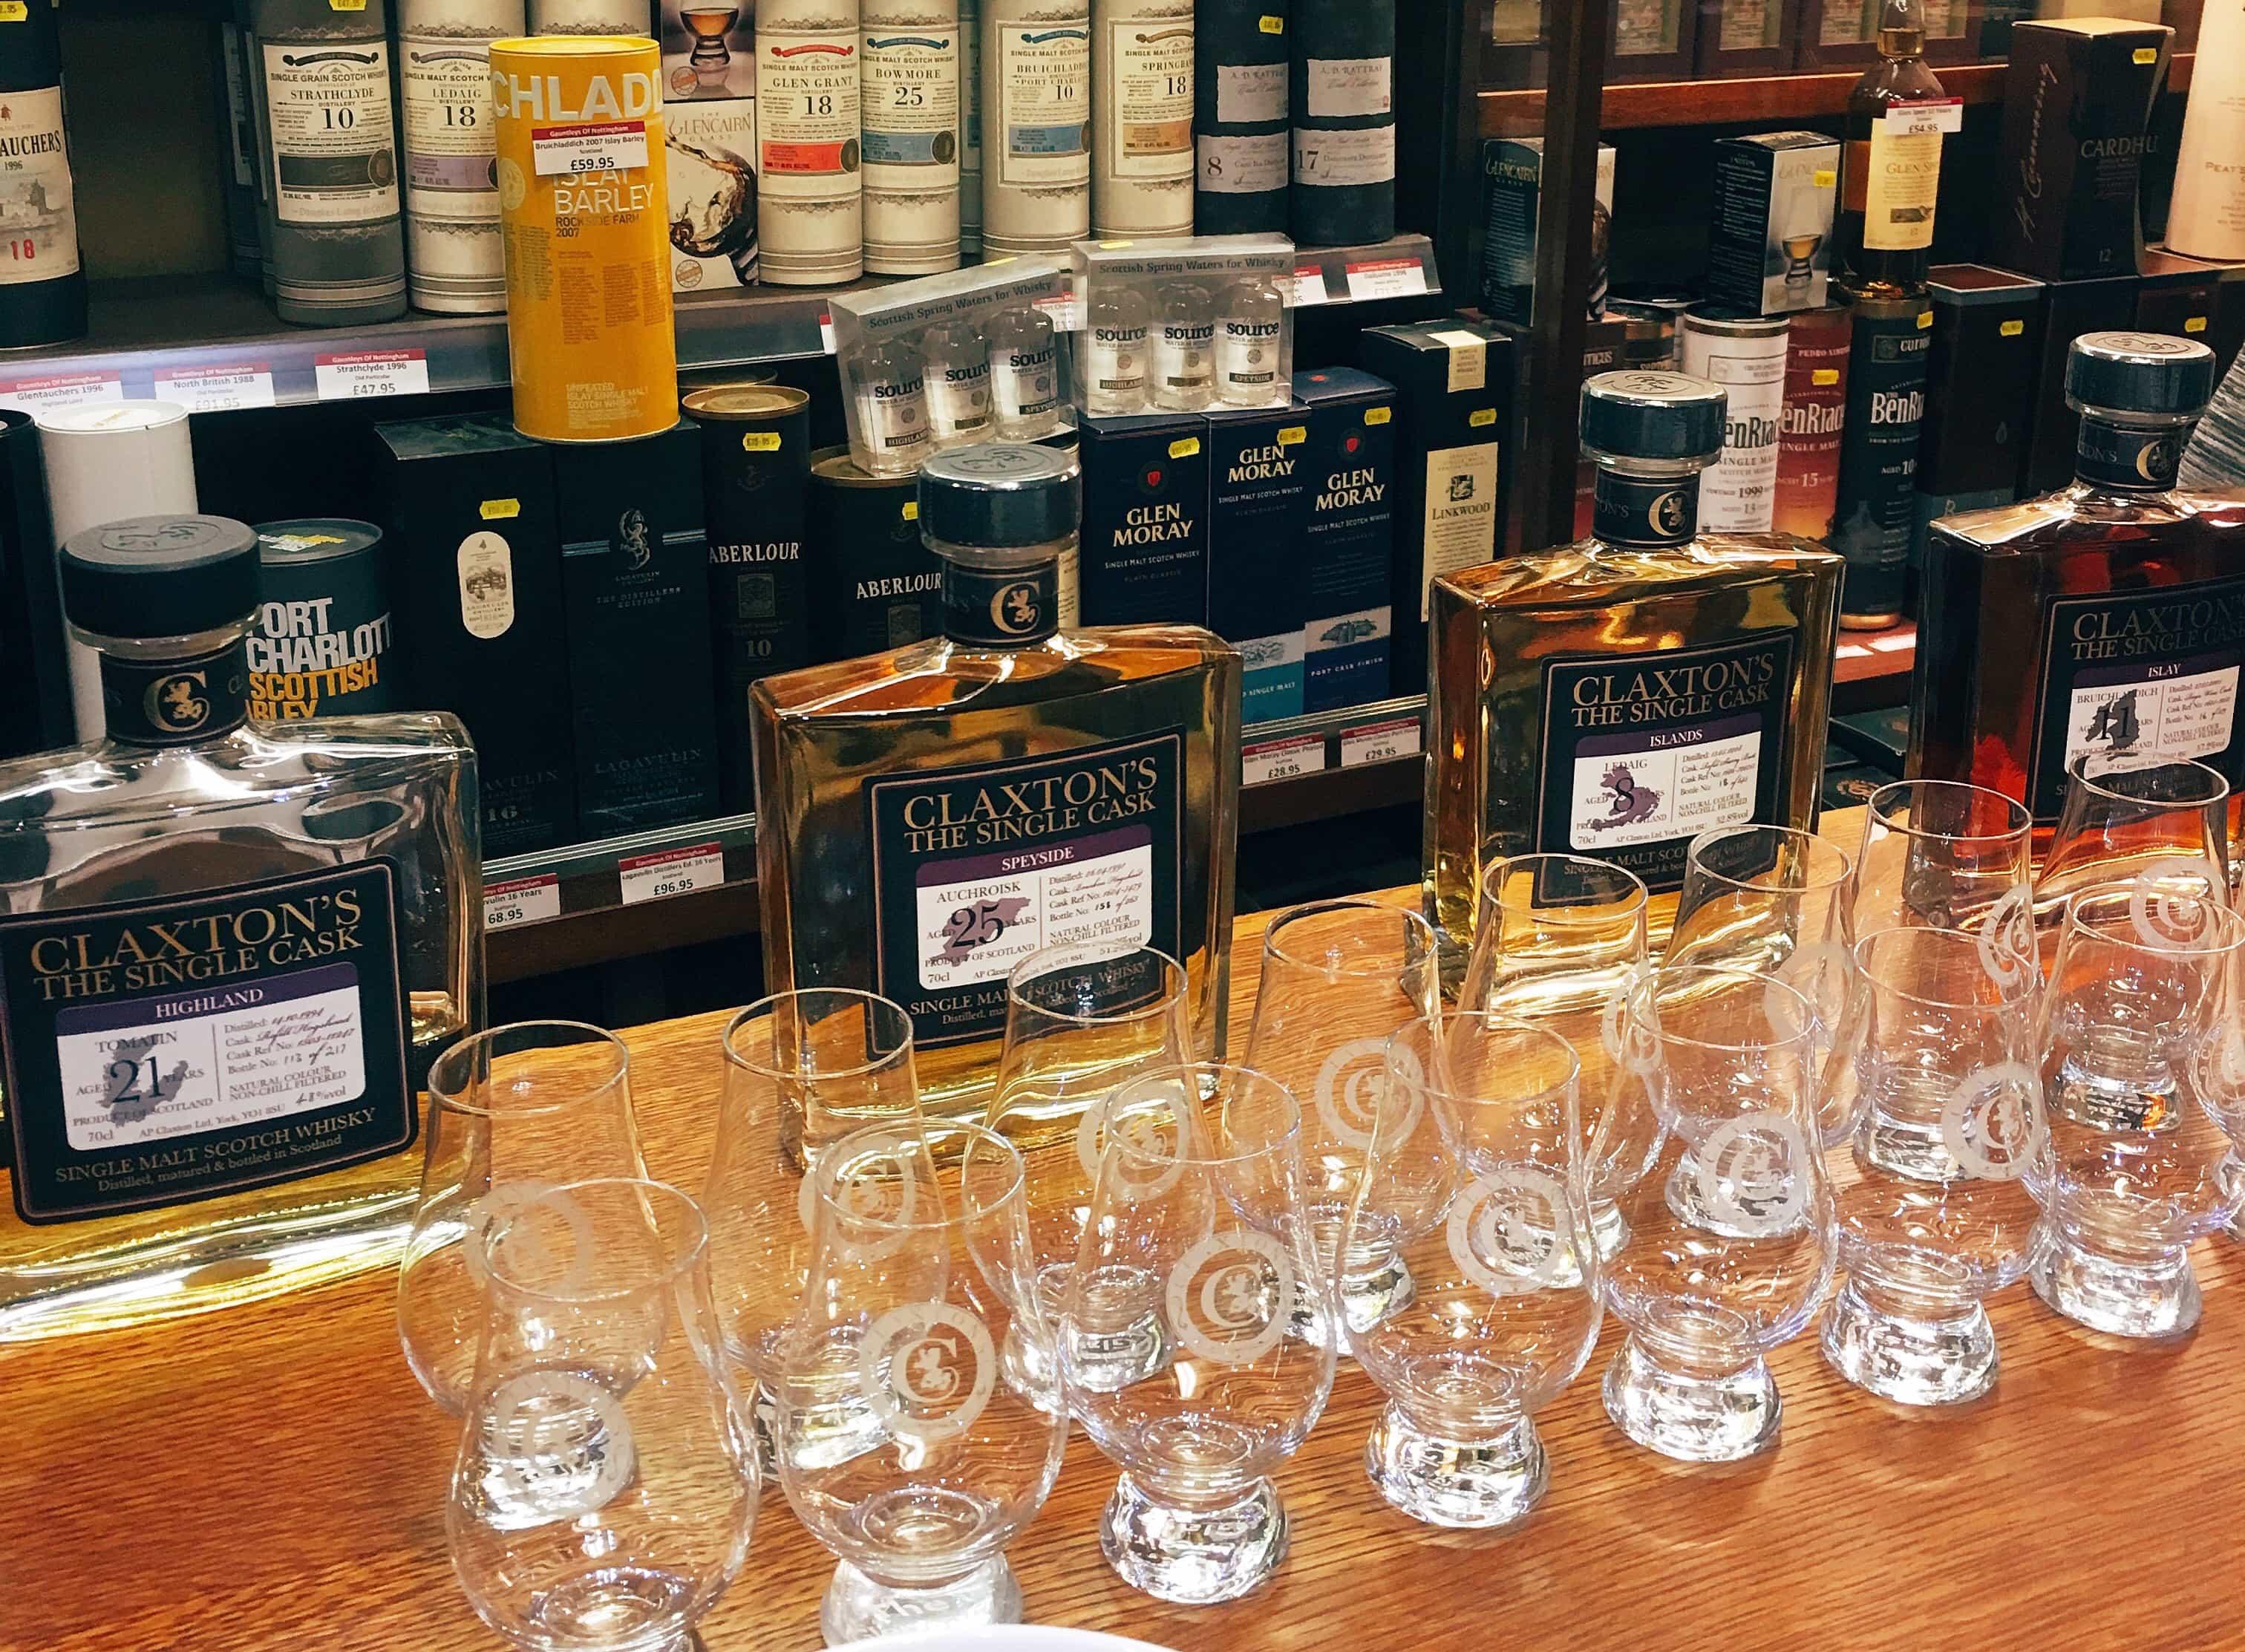 Claxton's Whiskies